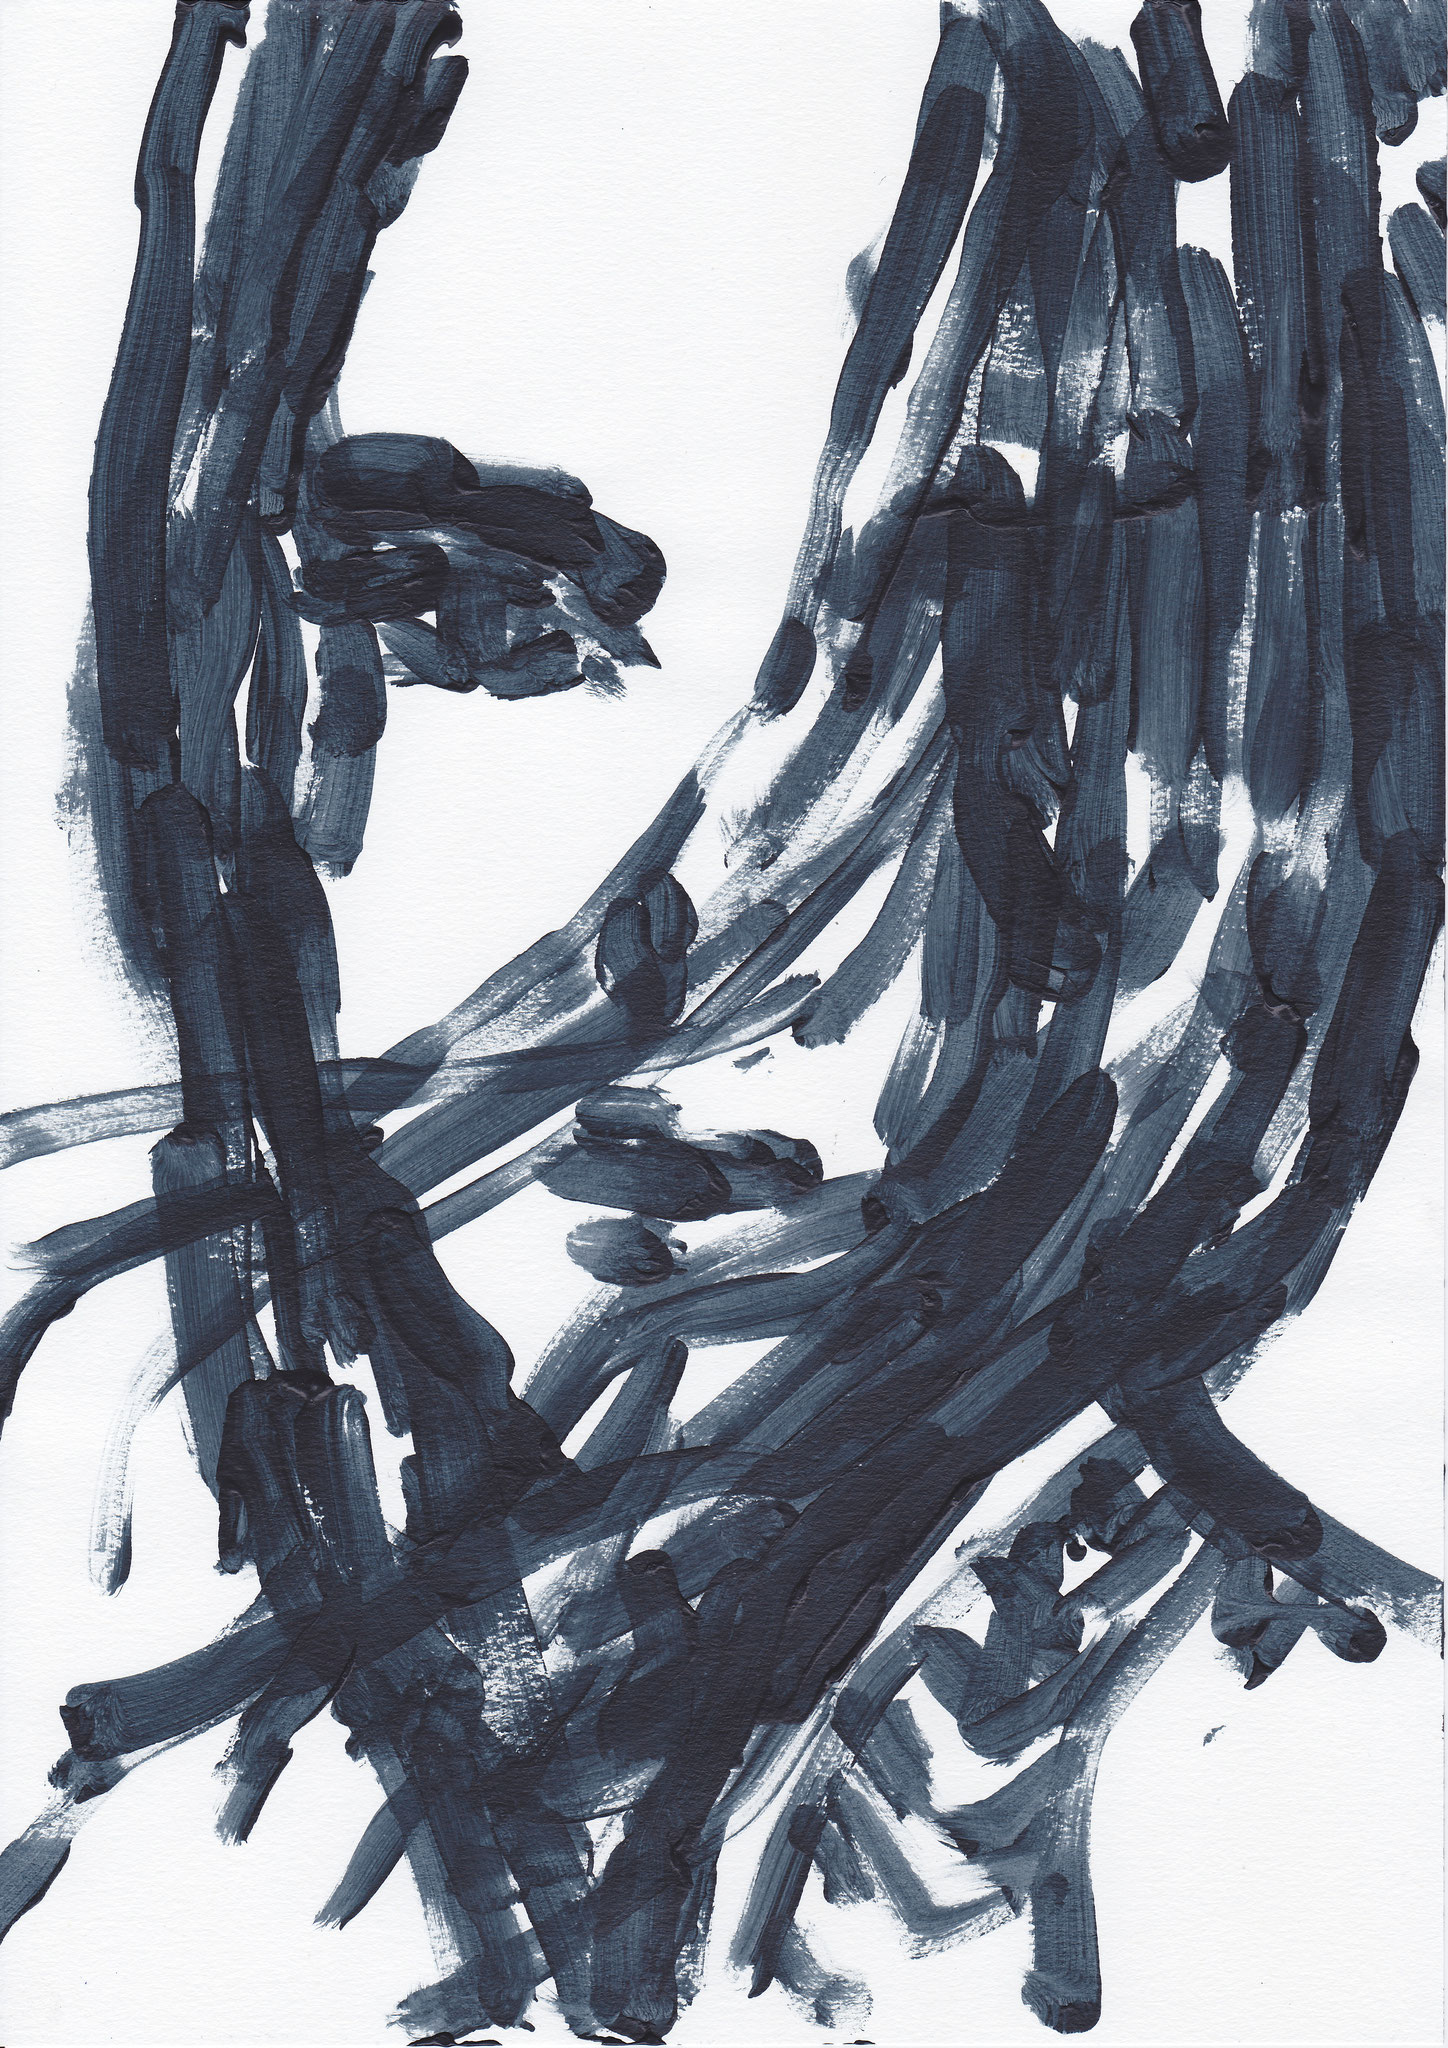 019 , acrylic on paper , 29.7 x 21cm , Selina Saranova